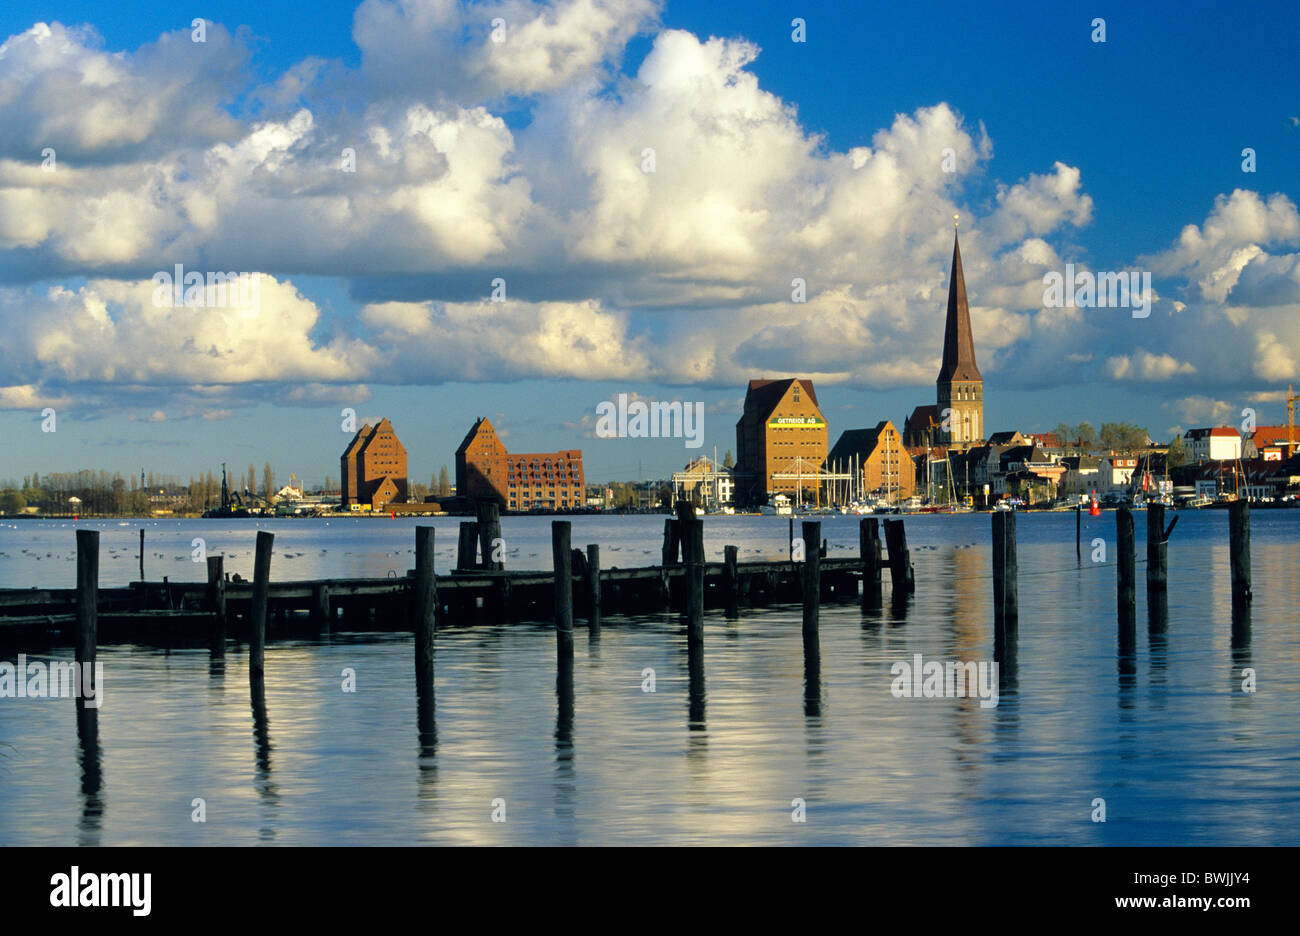 Hansa Rostock Stockfotos & Hansa Rostock Bilder - Alamy